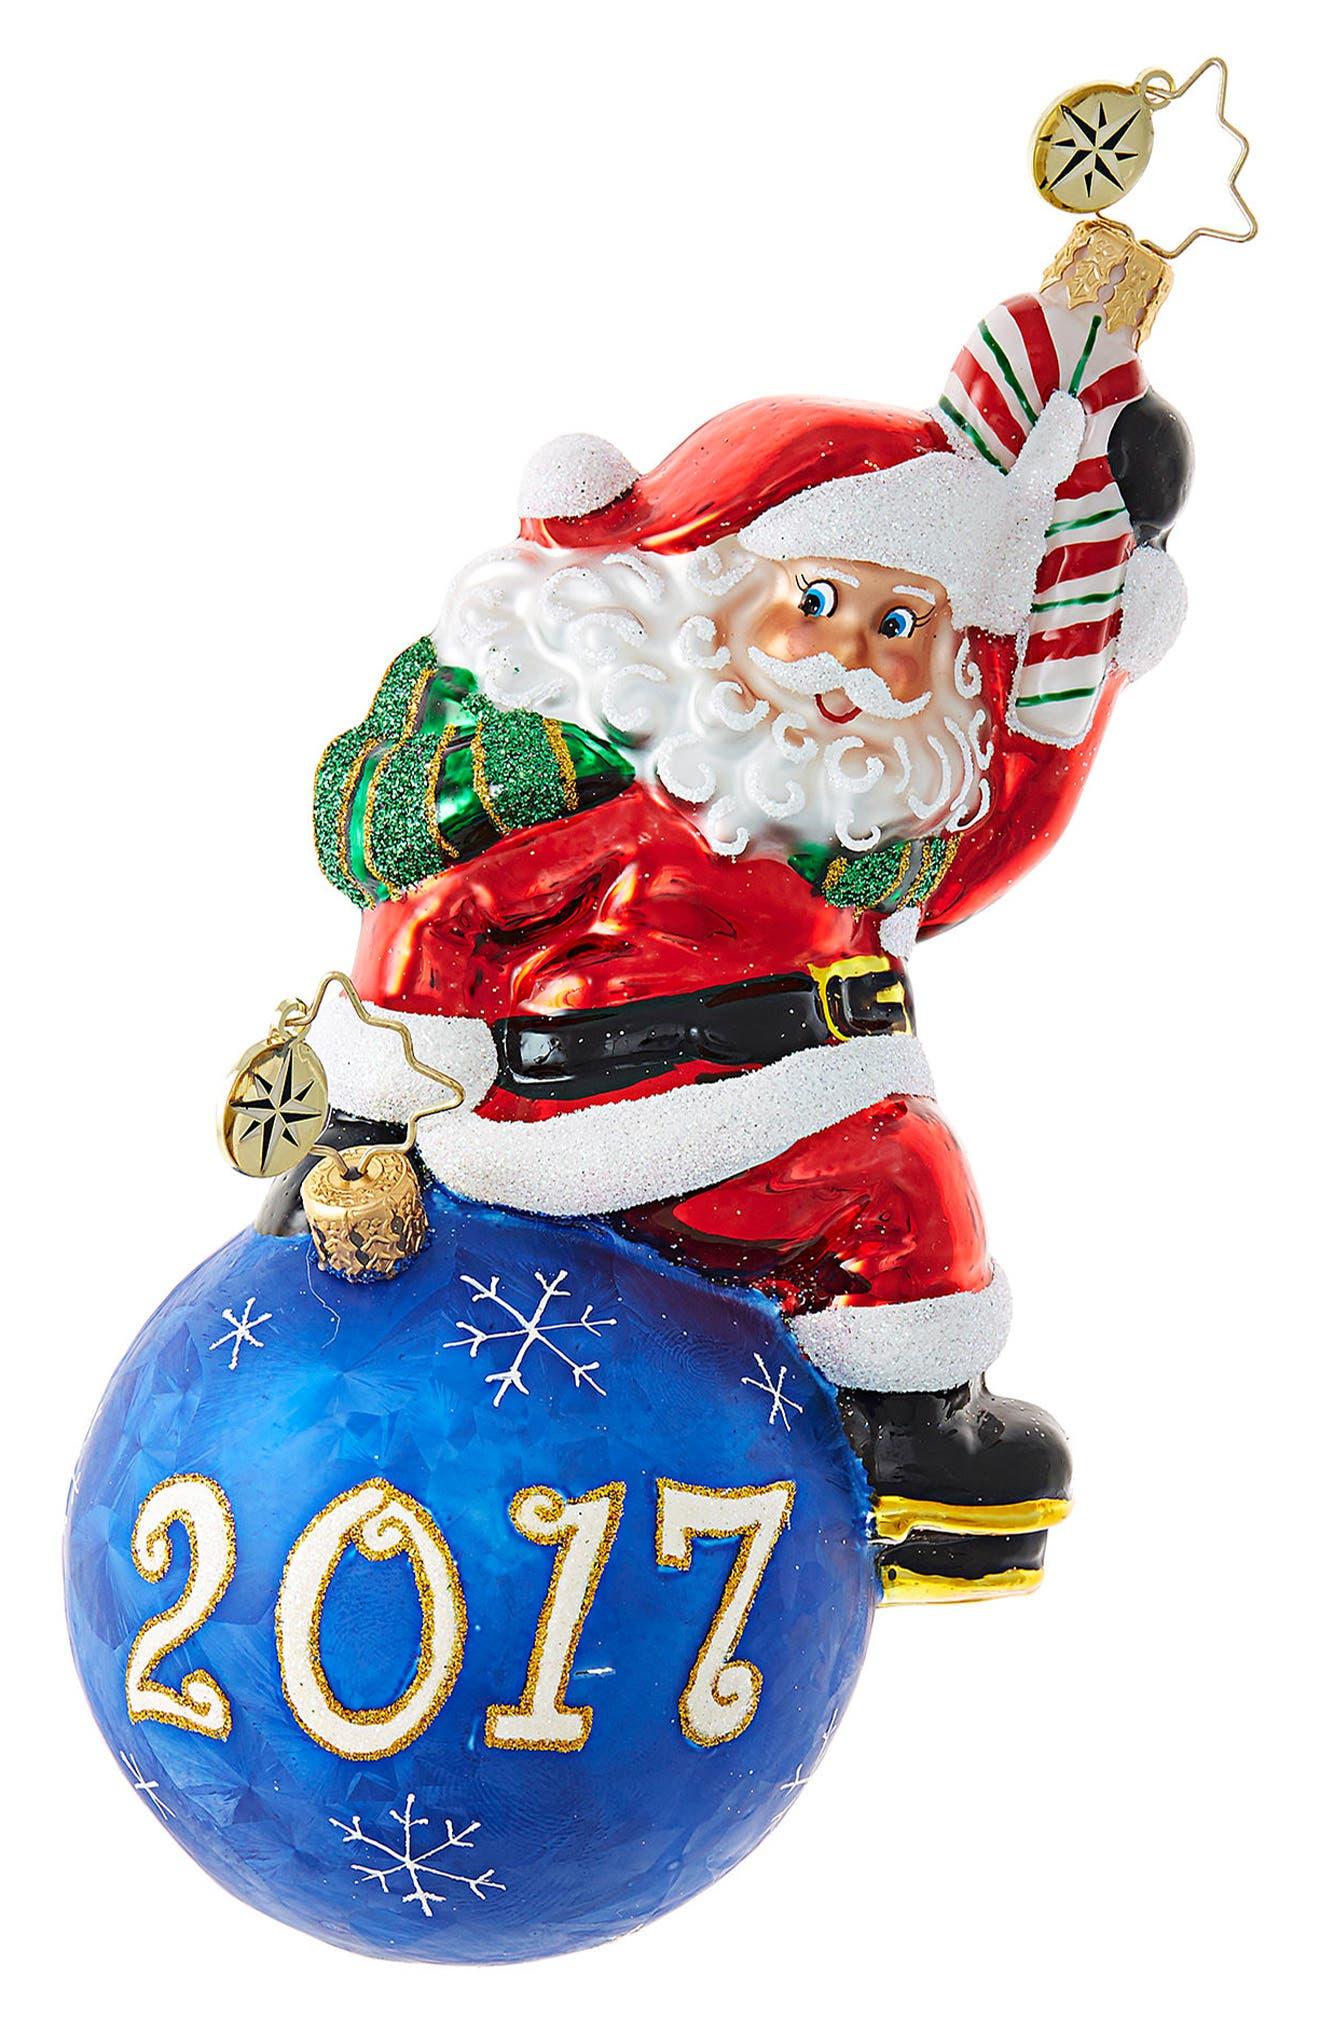 Having a Ball 2017 Santa Claus Ornament,                         Main,                         color, Blue/ Multi